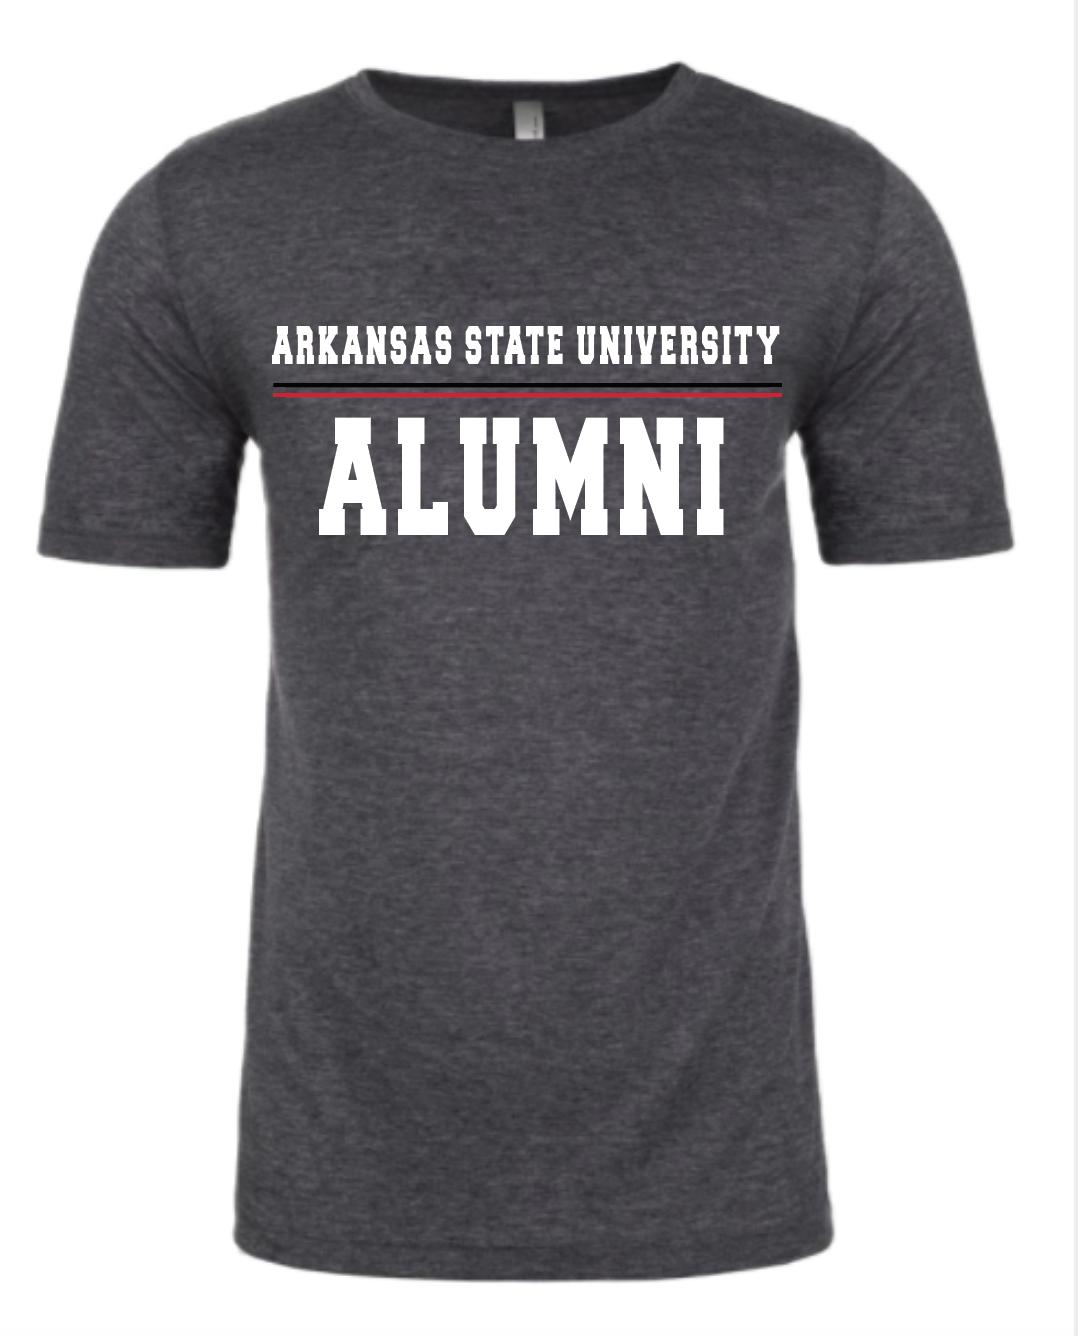 Arkansas State Alumni T Shirt